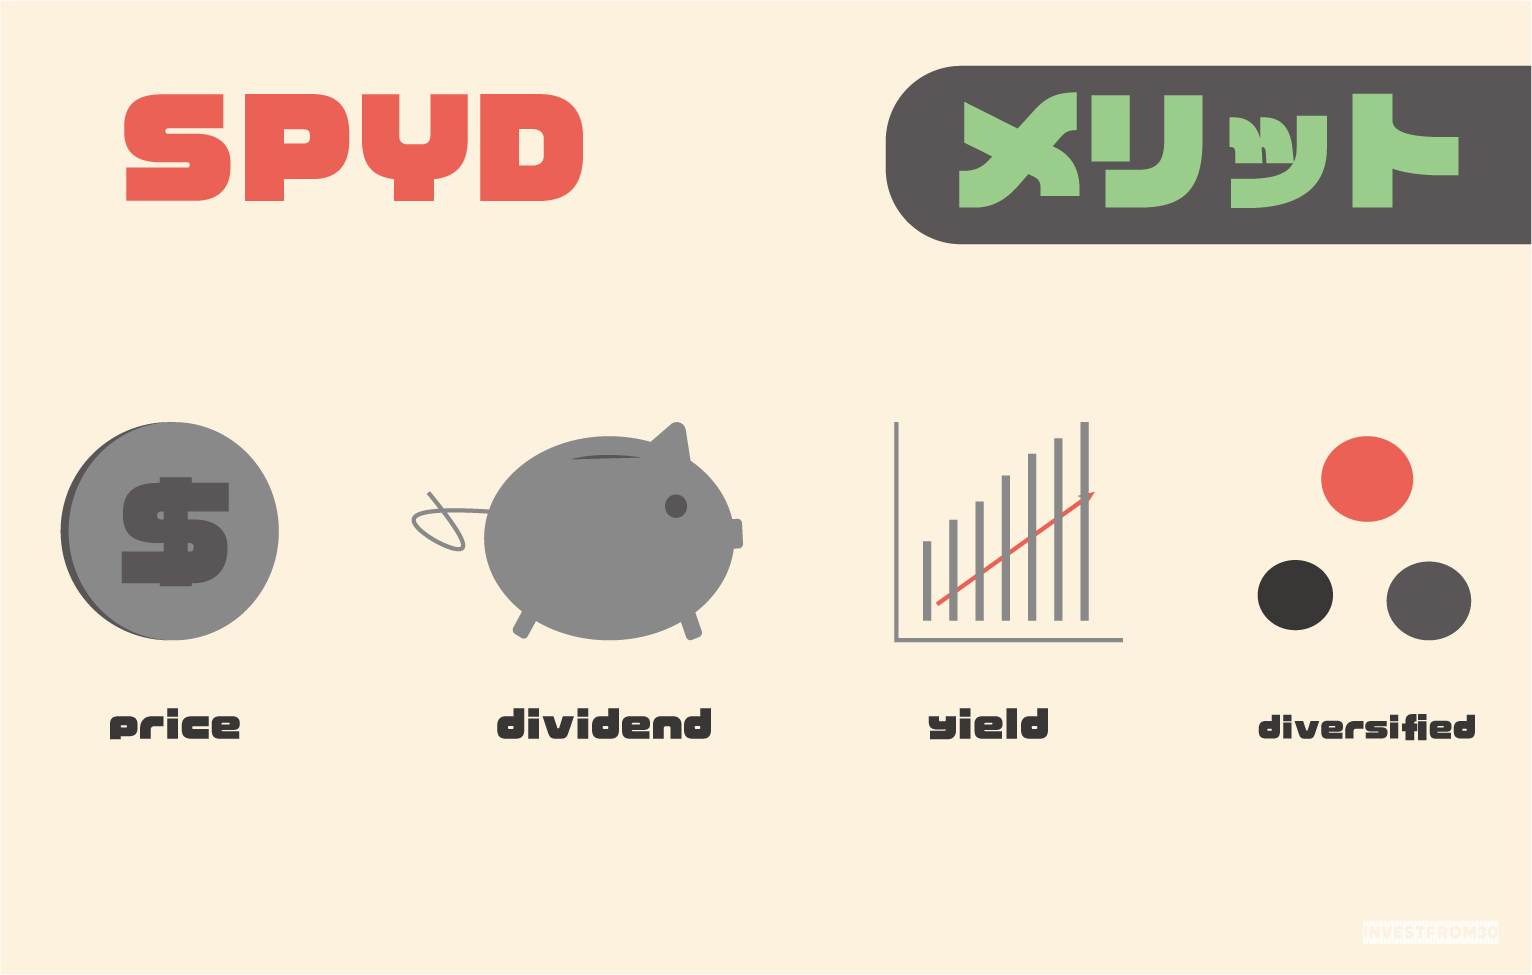 SPYD(SPDR ポートフォリオS&P 500 高配当株式ETF)を積み立てるメリット【米国株・株式投資】